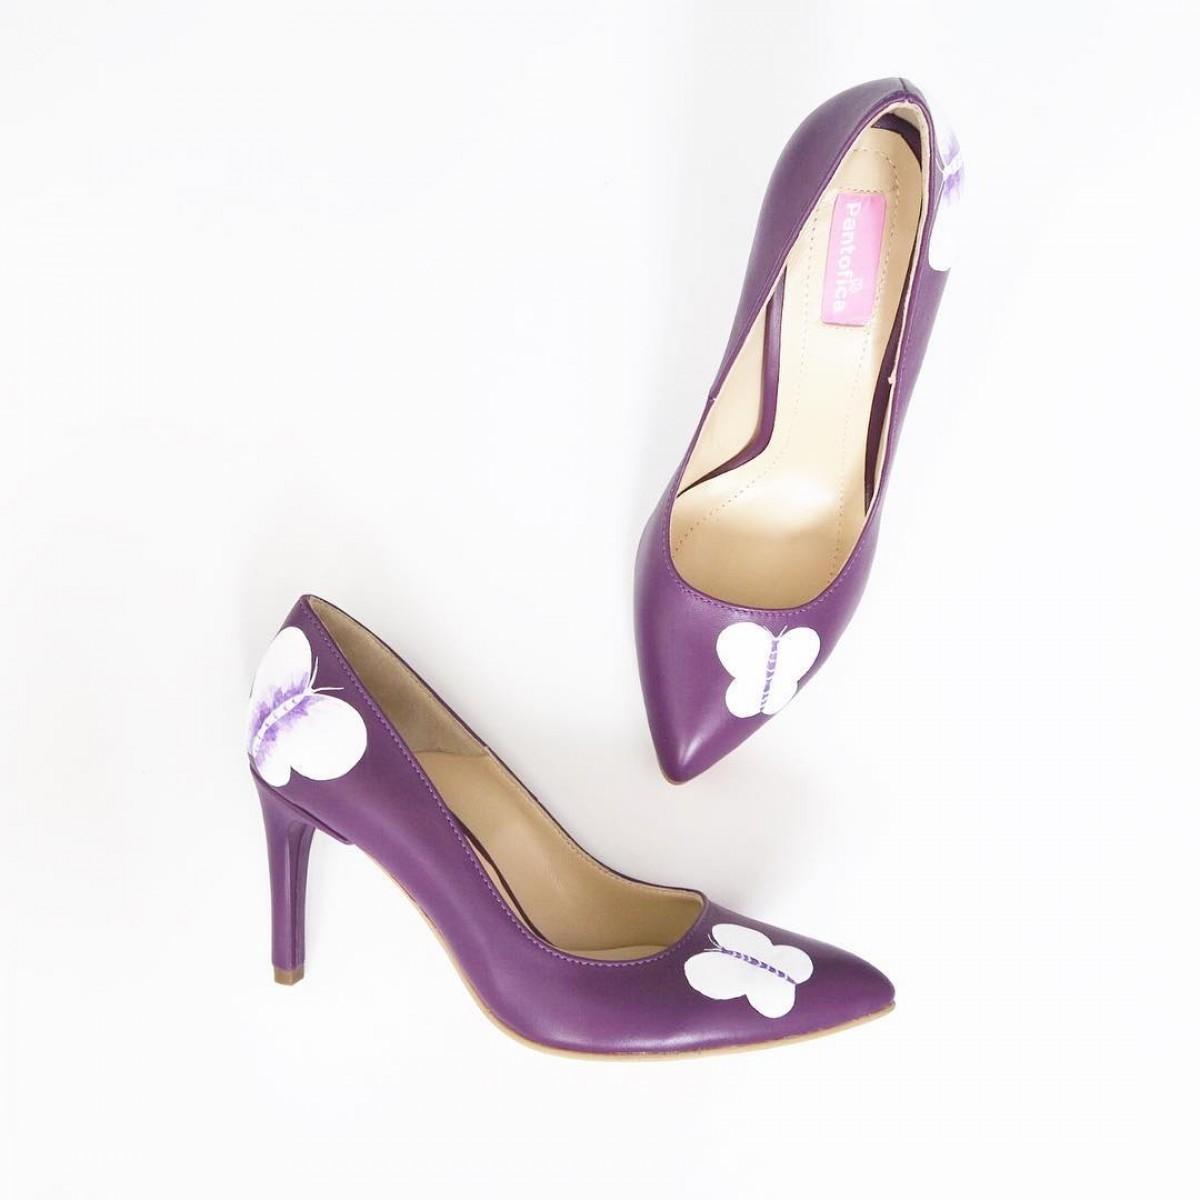 Pantofi Jelly HandPainted